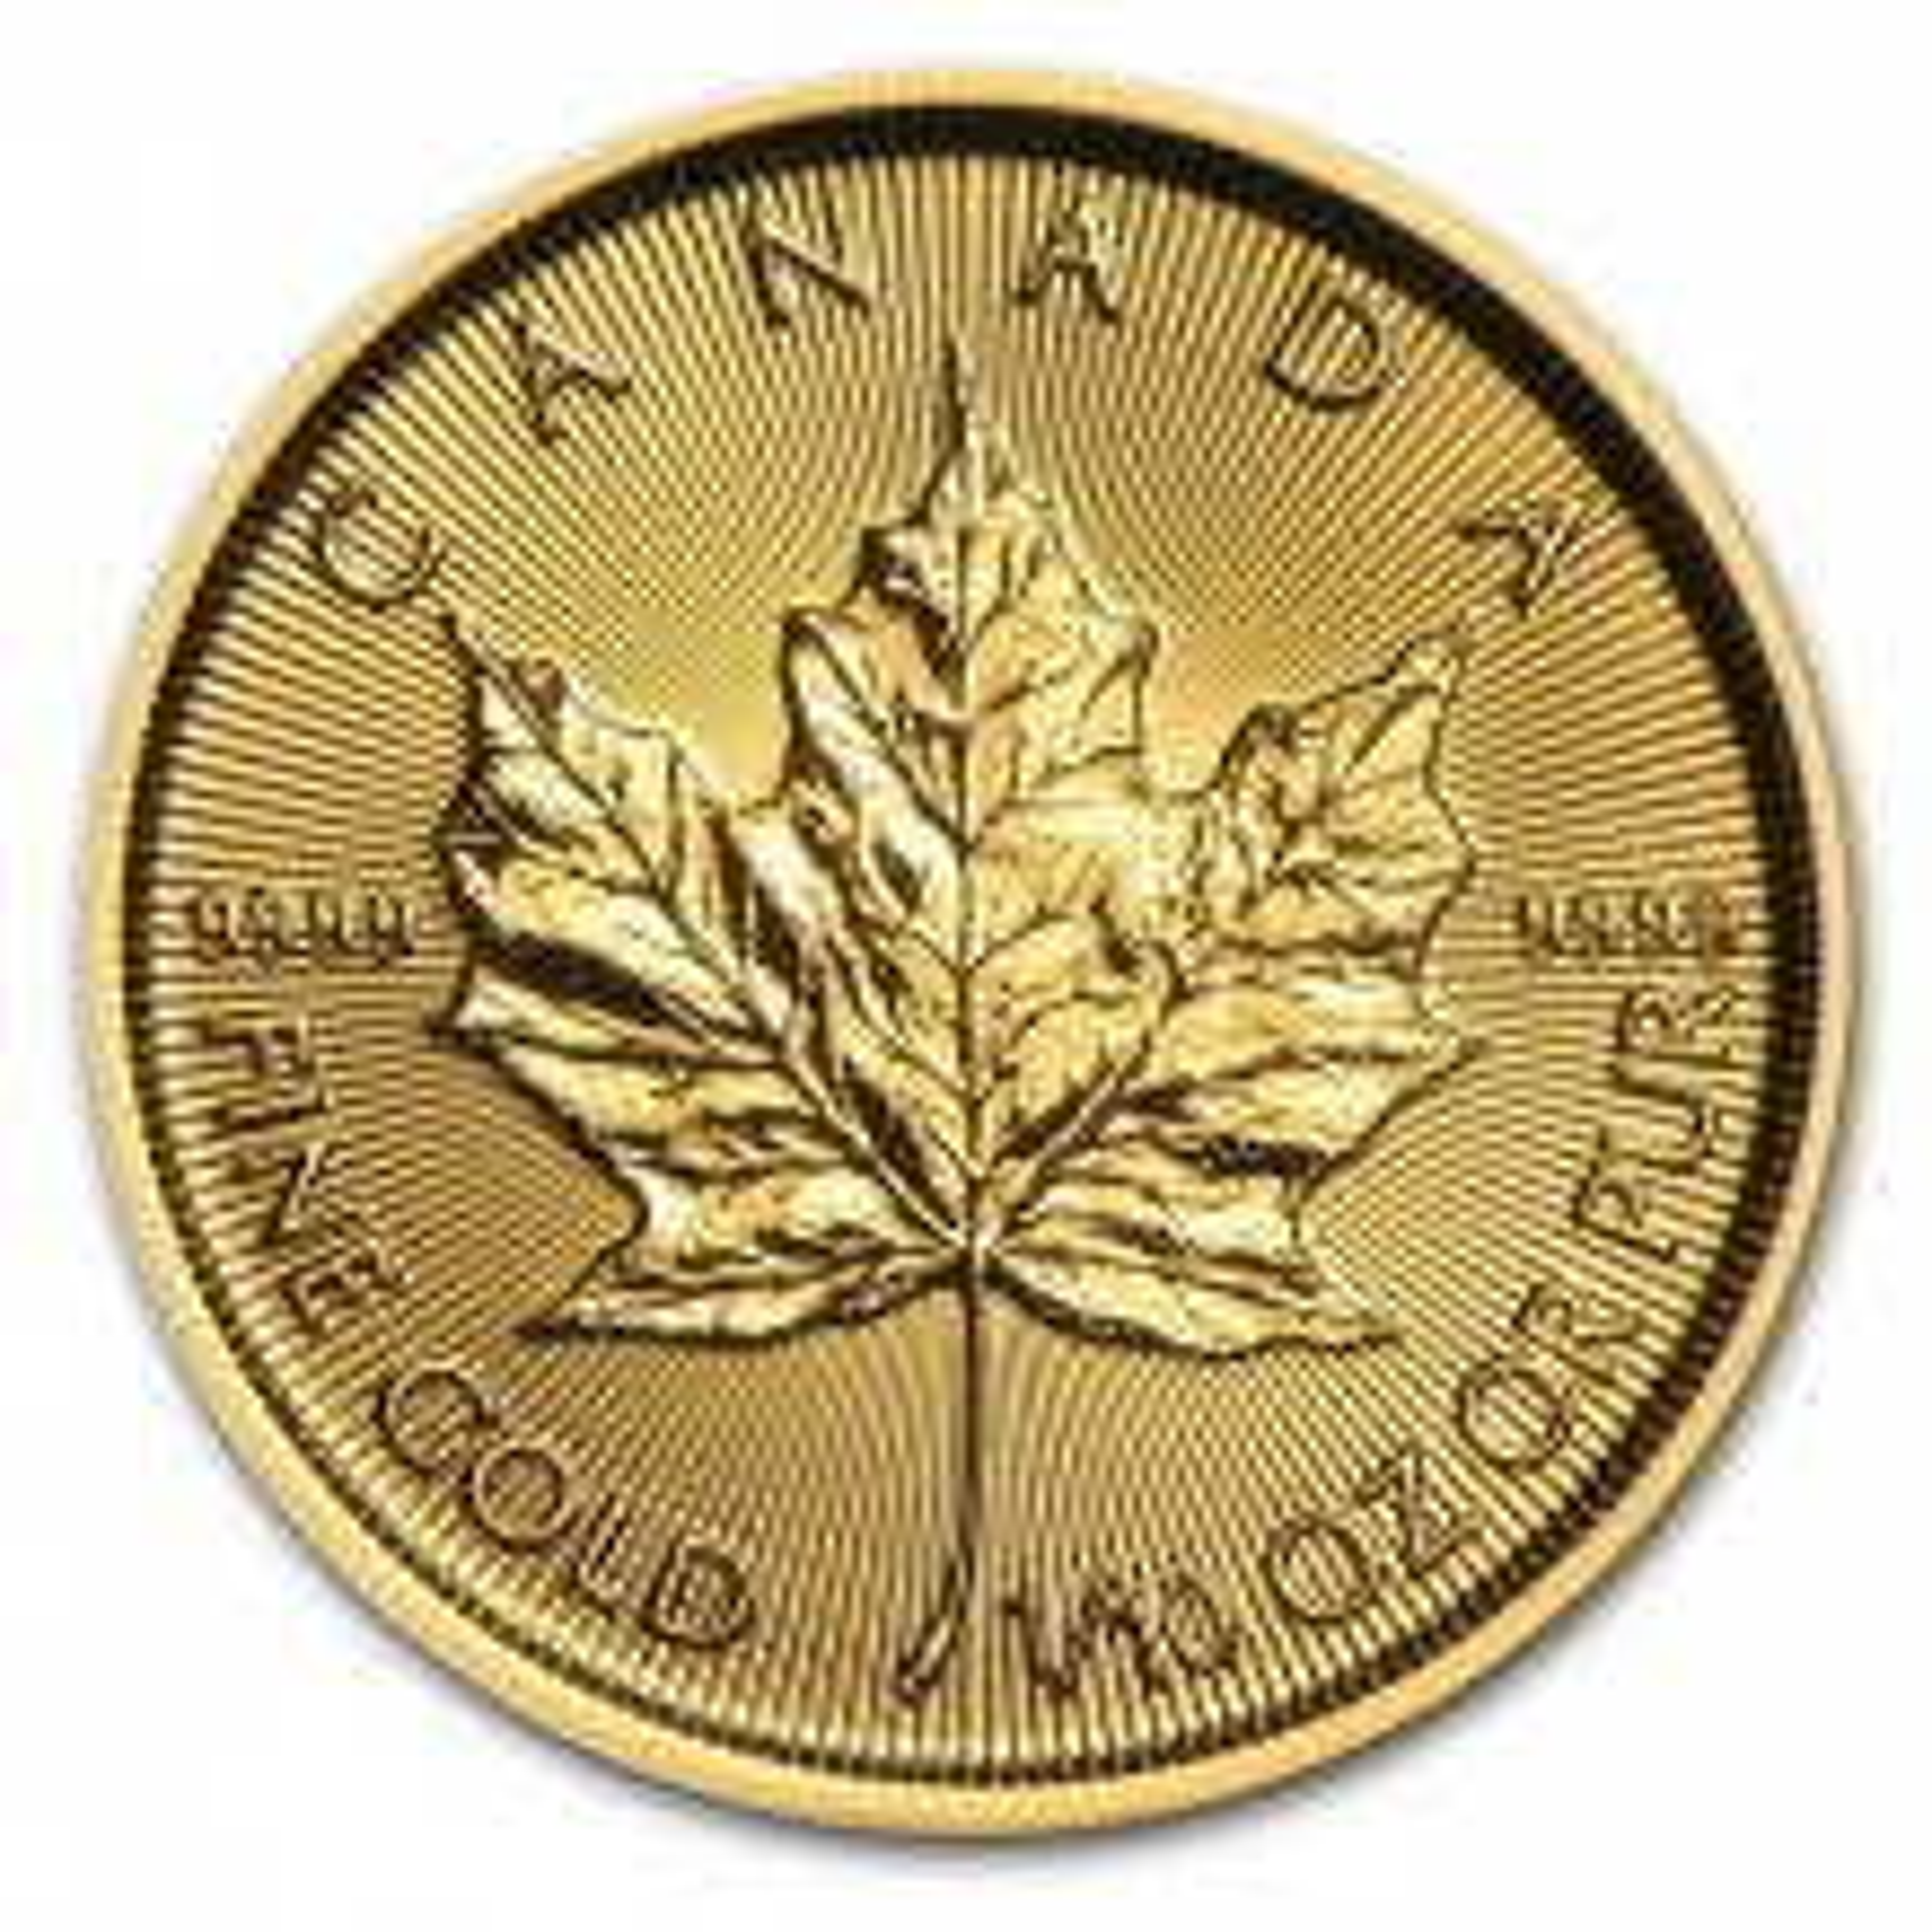 Gouden 1/10 troy ounce Maple Leaf munt Hologram